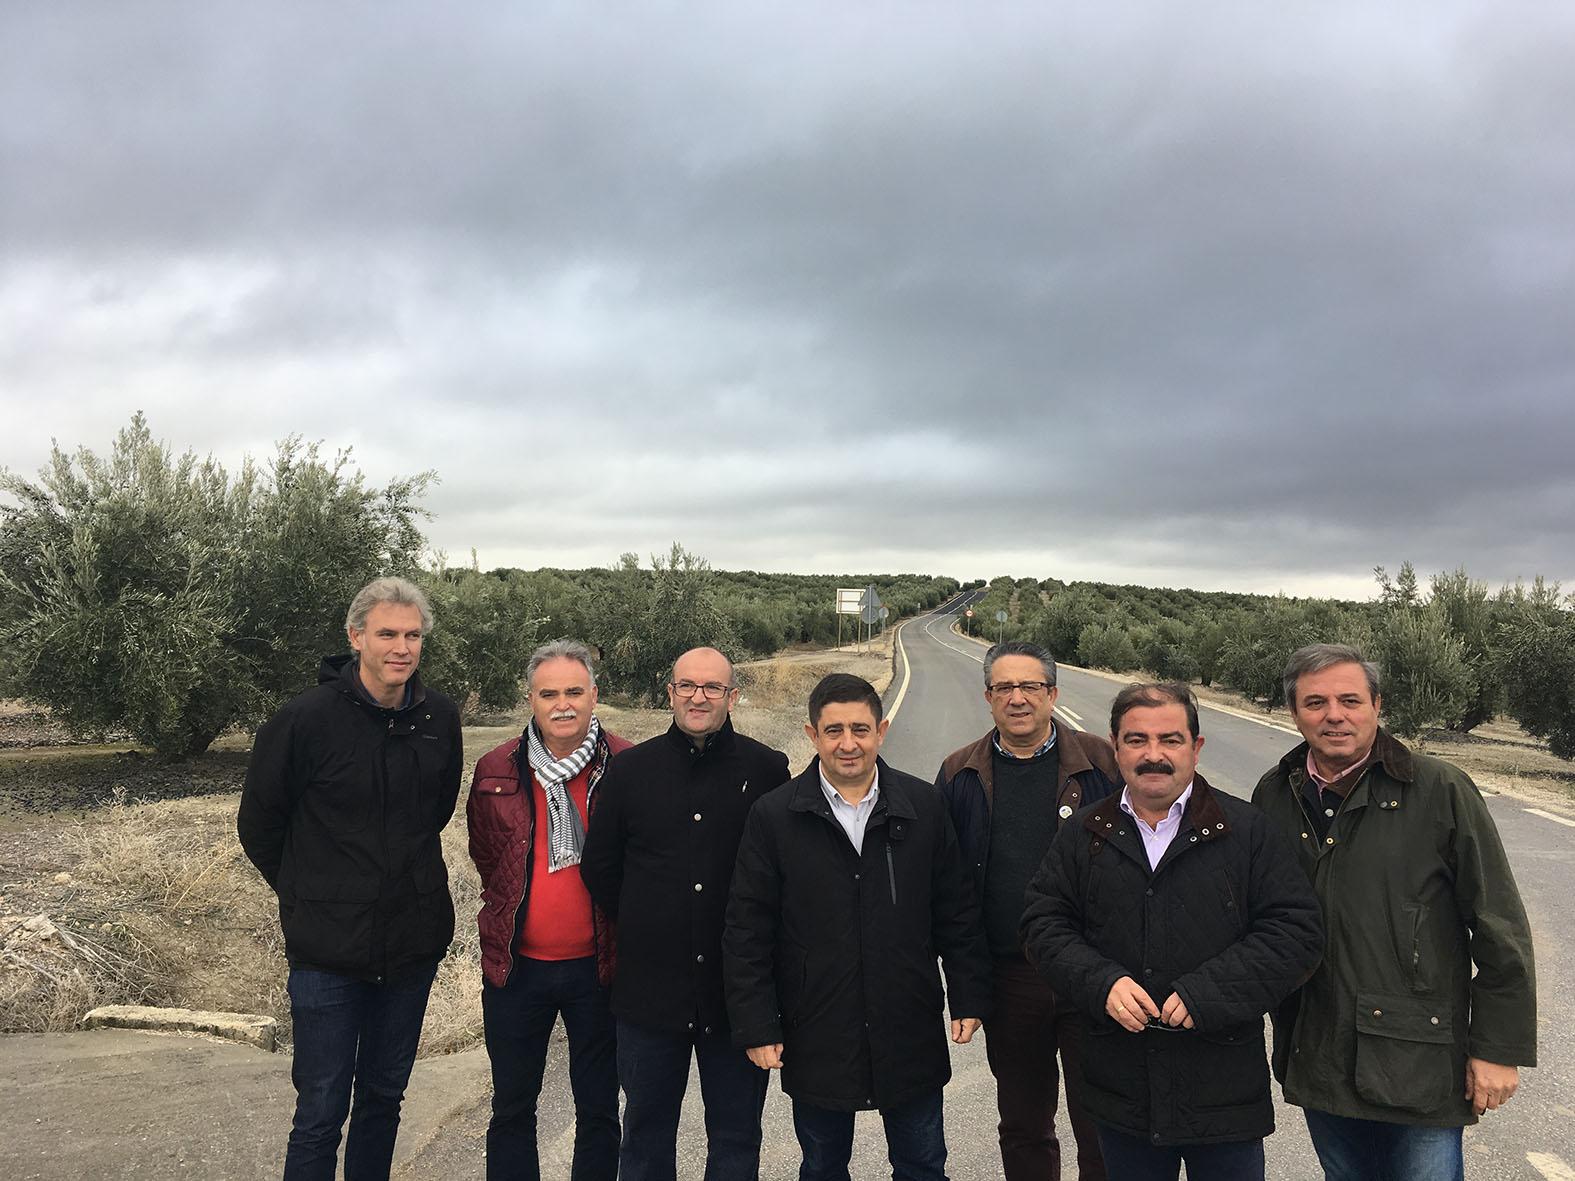 Diputación culmina la mejora de la vía entre Pilar de Moya e Higuera de Calatrava